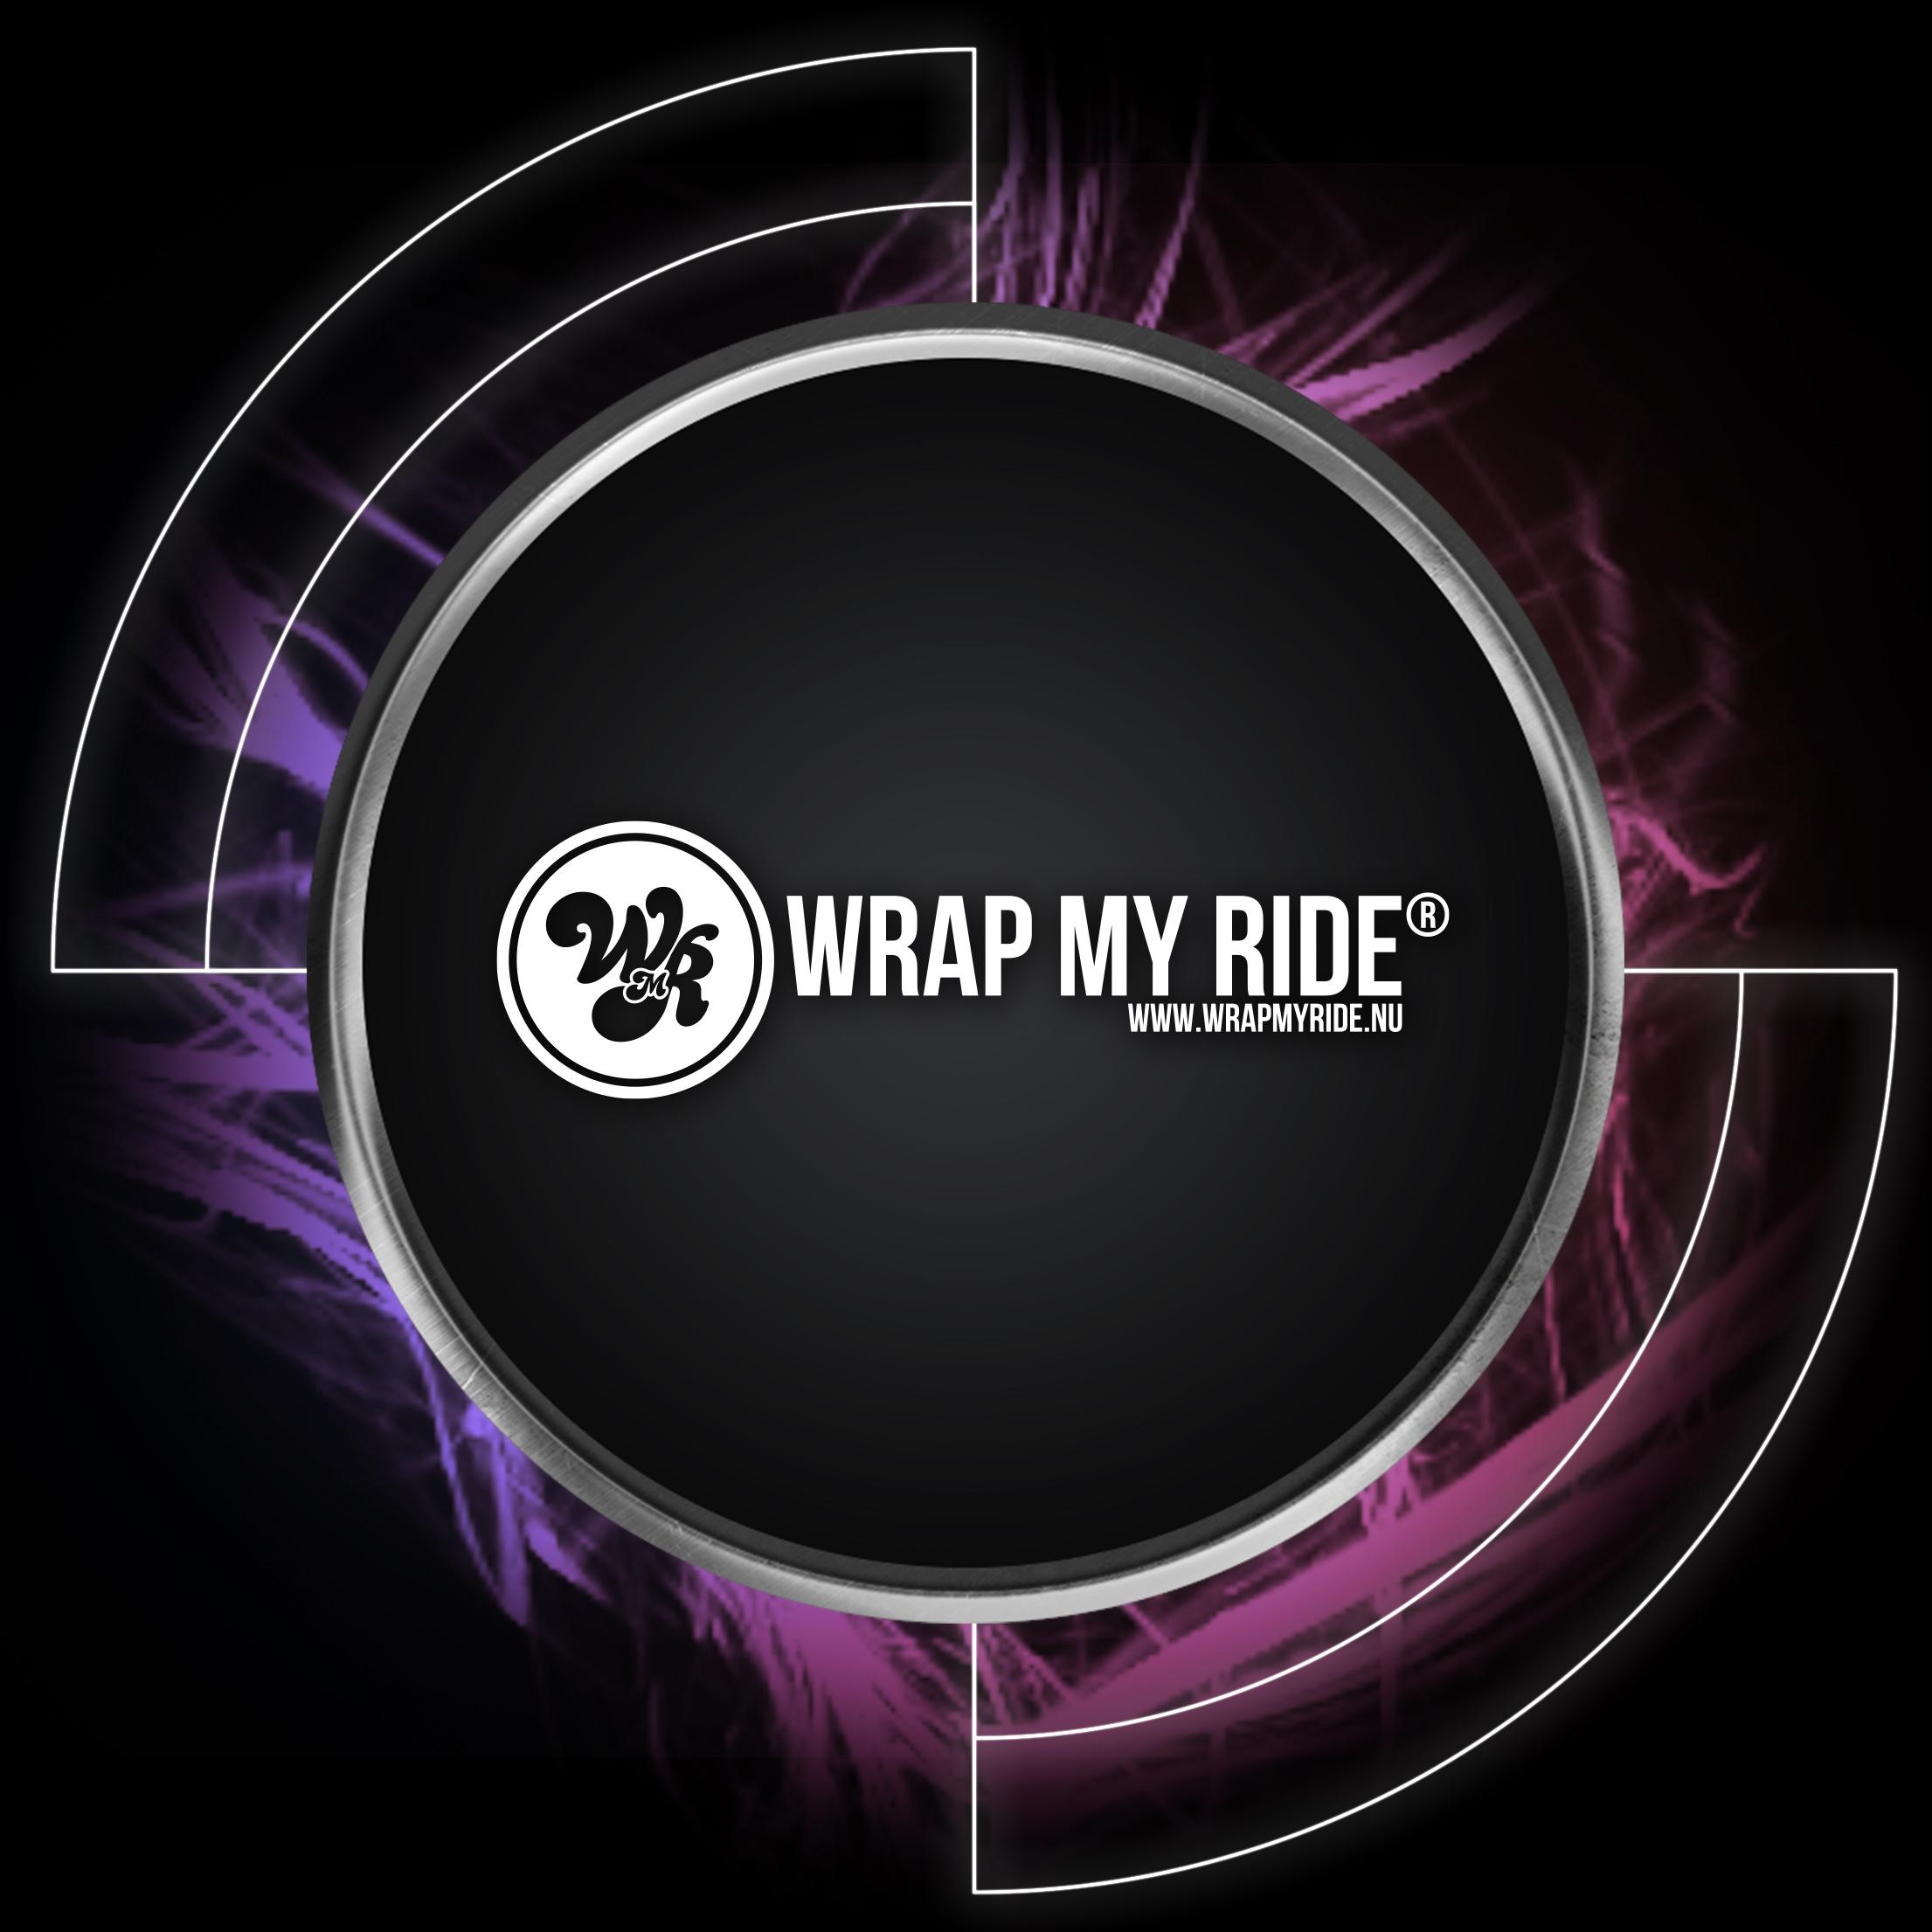 Wrap my Ride